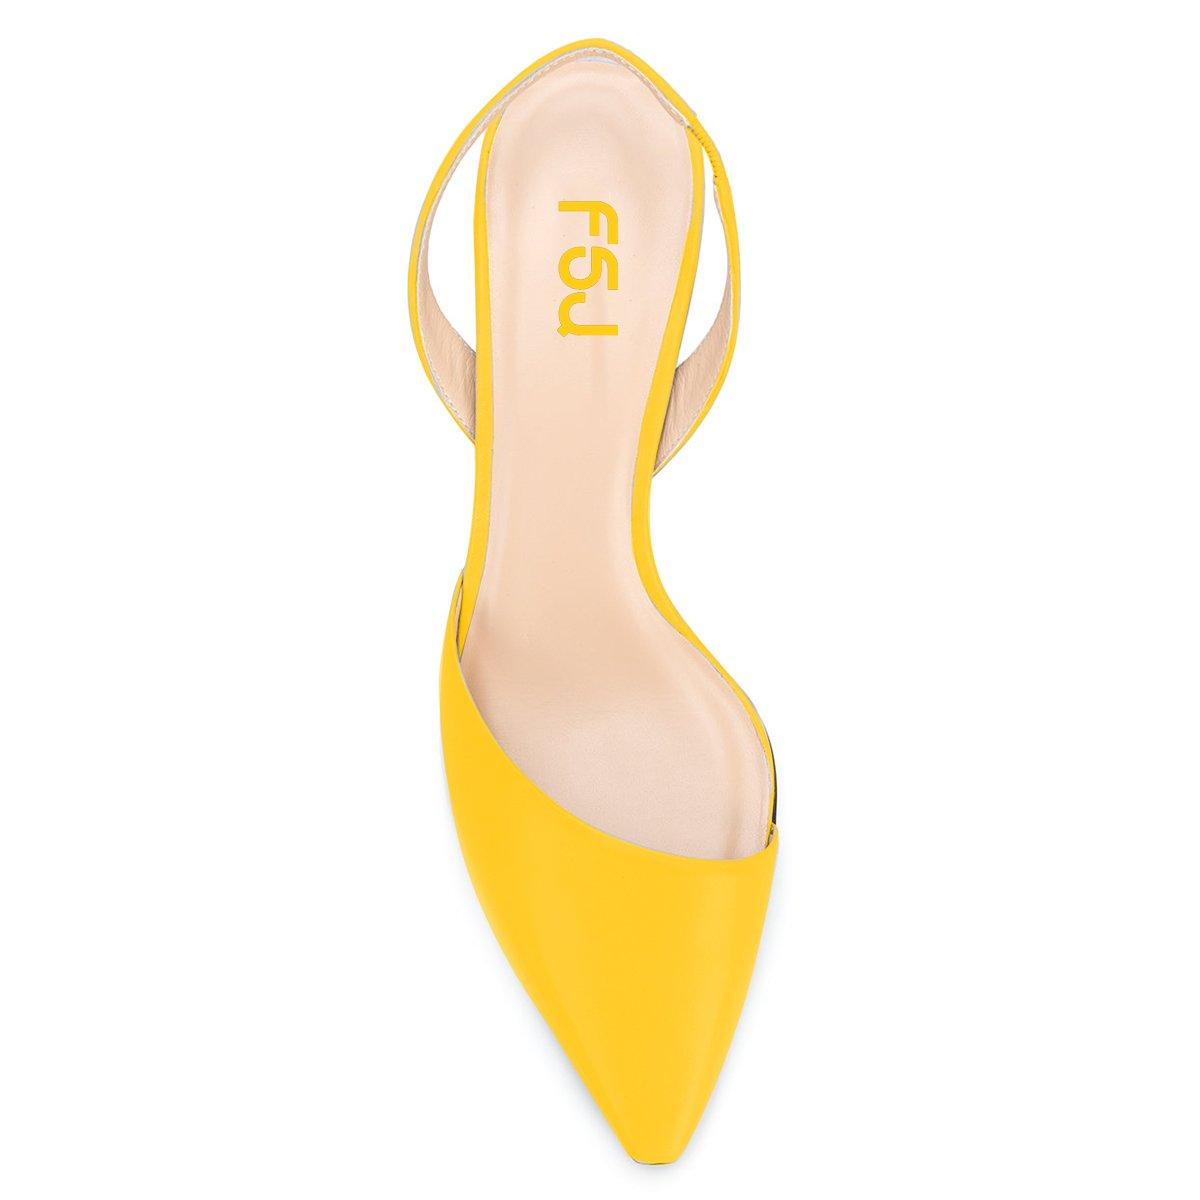 8c39af2b78f ... FSJ Women Classic Pointy Toe Toe Toe Pumps Chunky Mid Heels Slingback Sandals  Comfortable Shoes Size ...